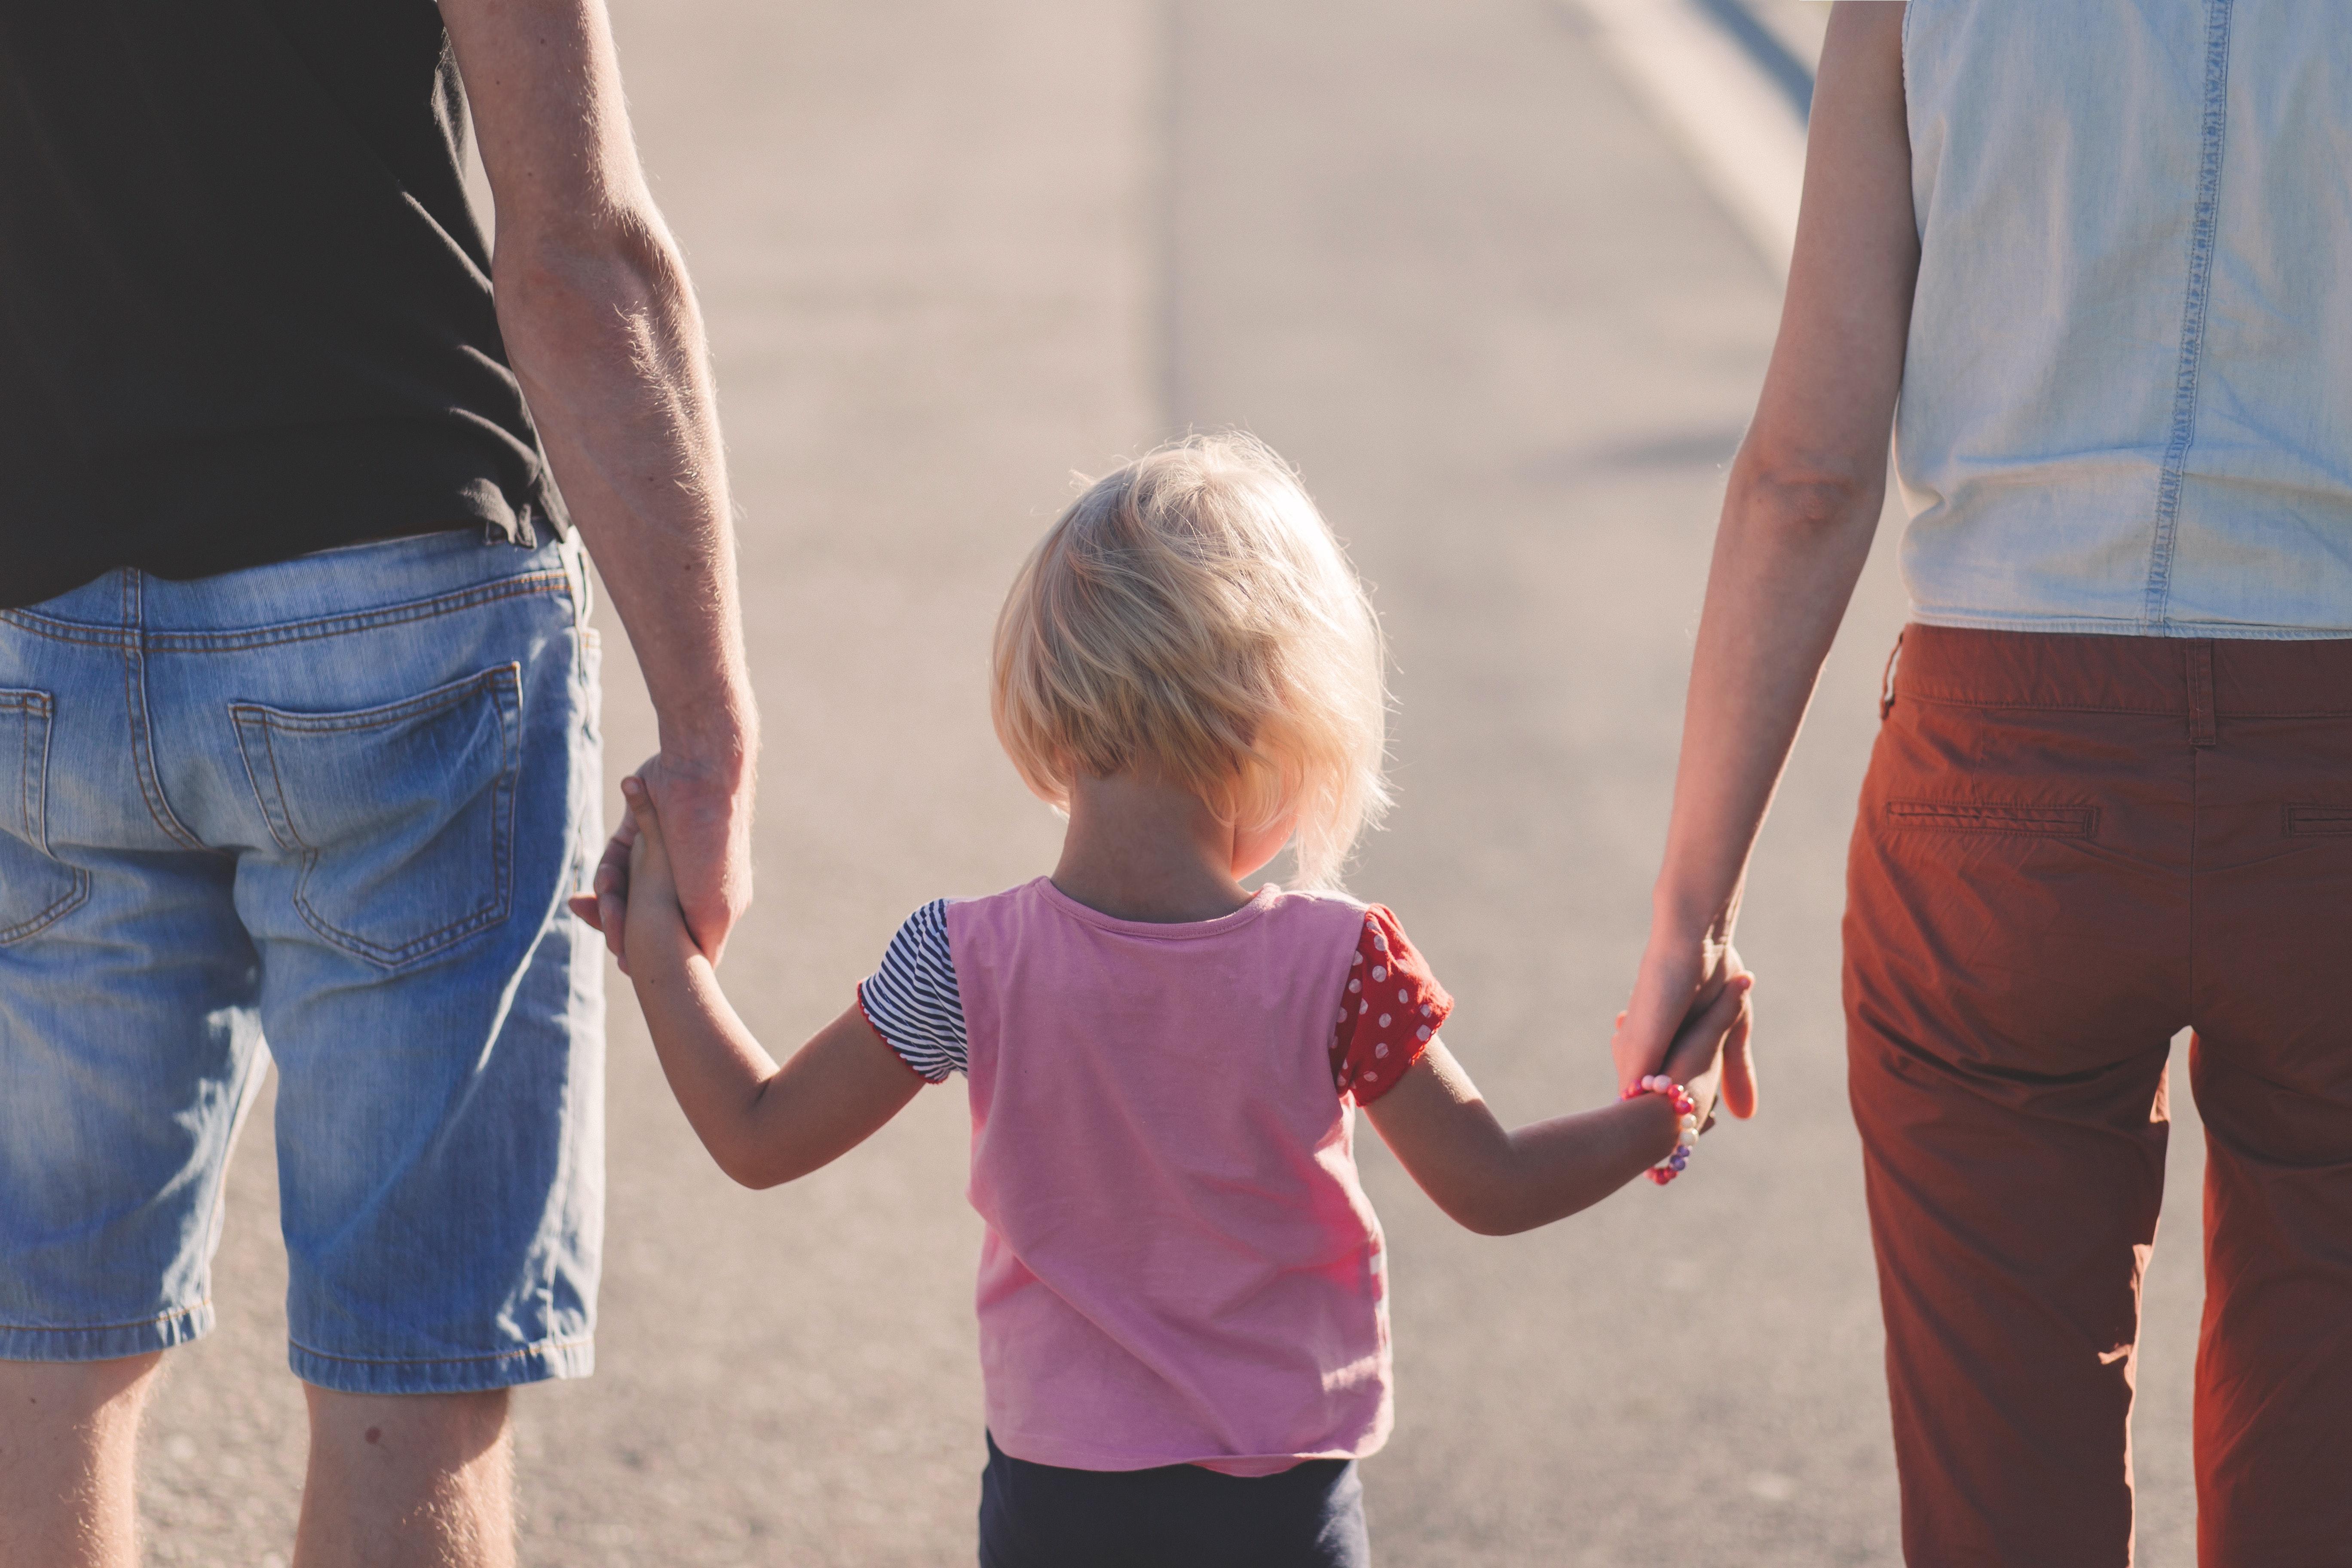 Foto: © freestocks.org